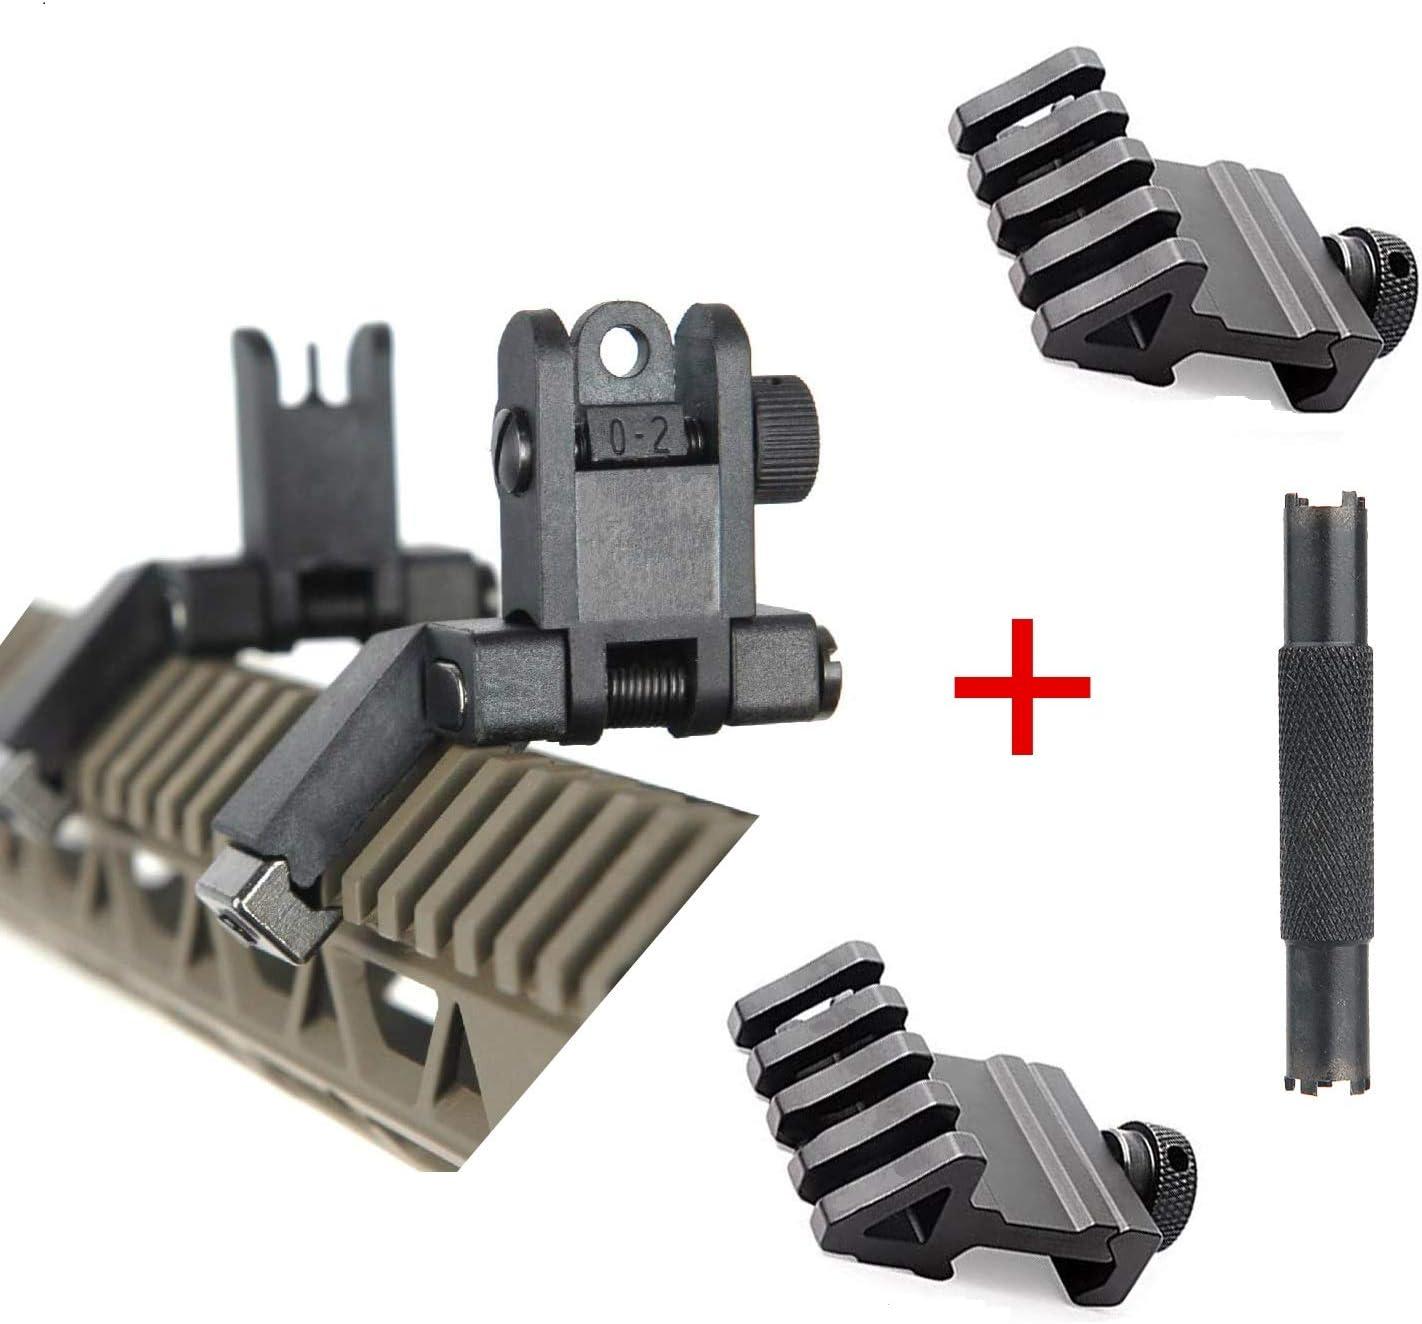 IORMAN 2 Pcs 45 Degree Rail Mount 4 Slots Rail and 1 Pcs Ultralight Flip Up Sight 45 Degree Offset Front and Backup Rear Sight and 1 Pcs Front Sight Adjustment Tool